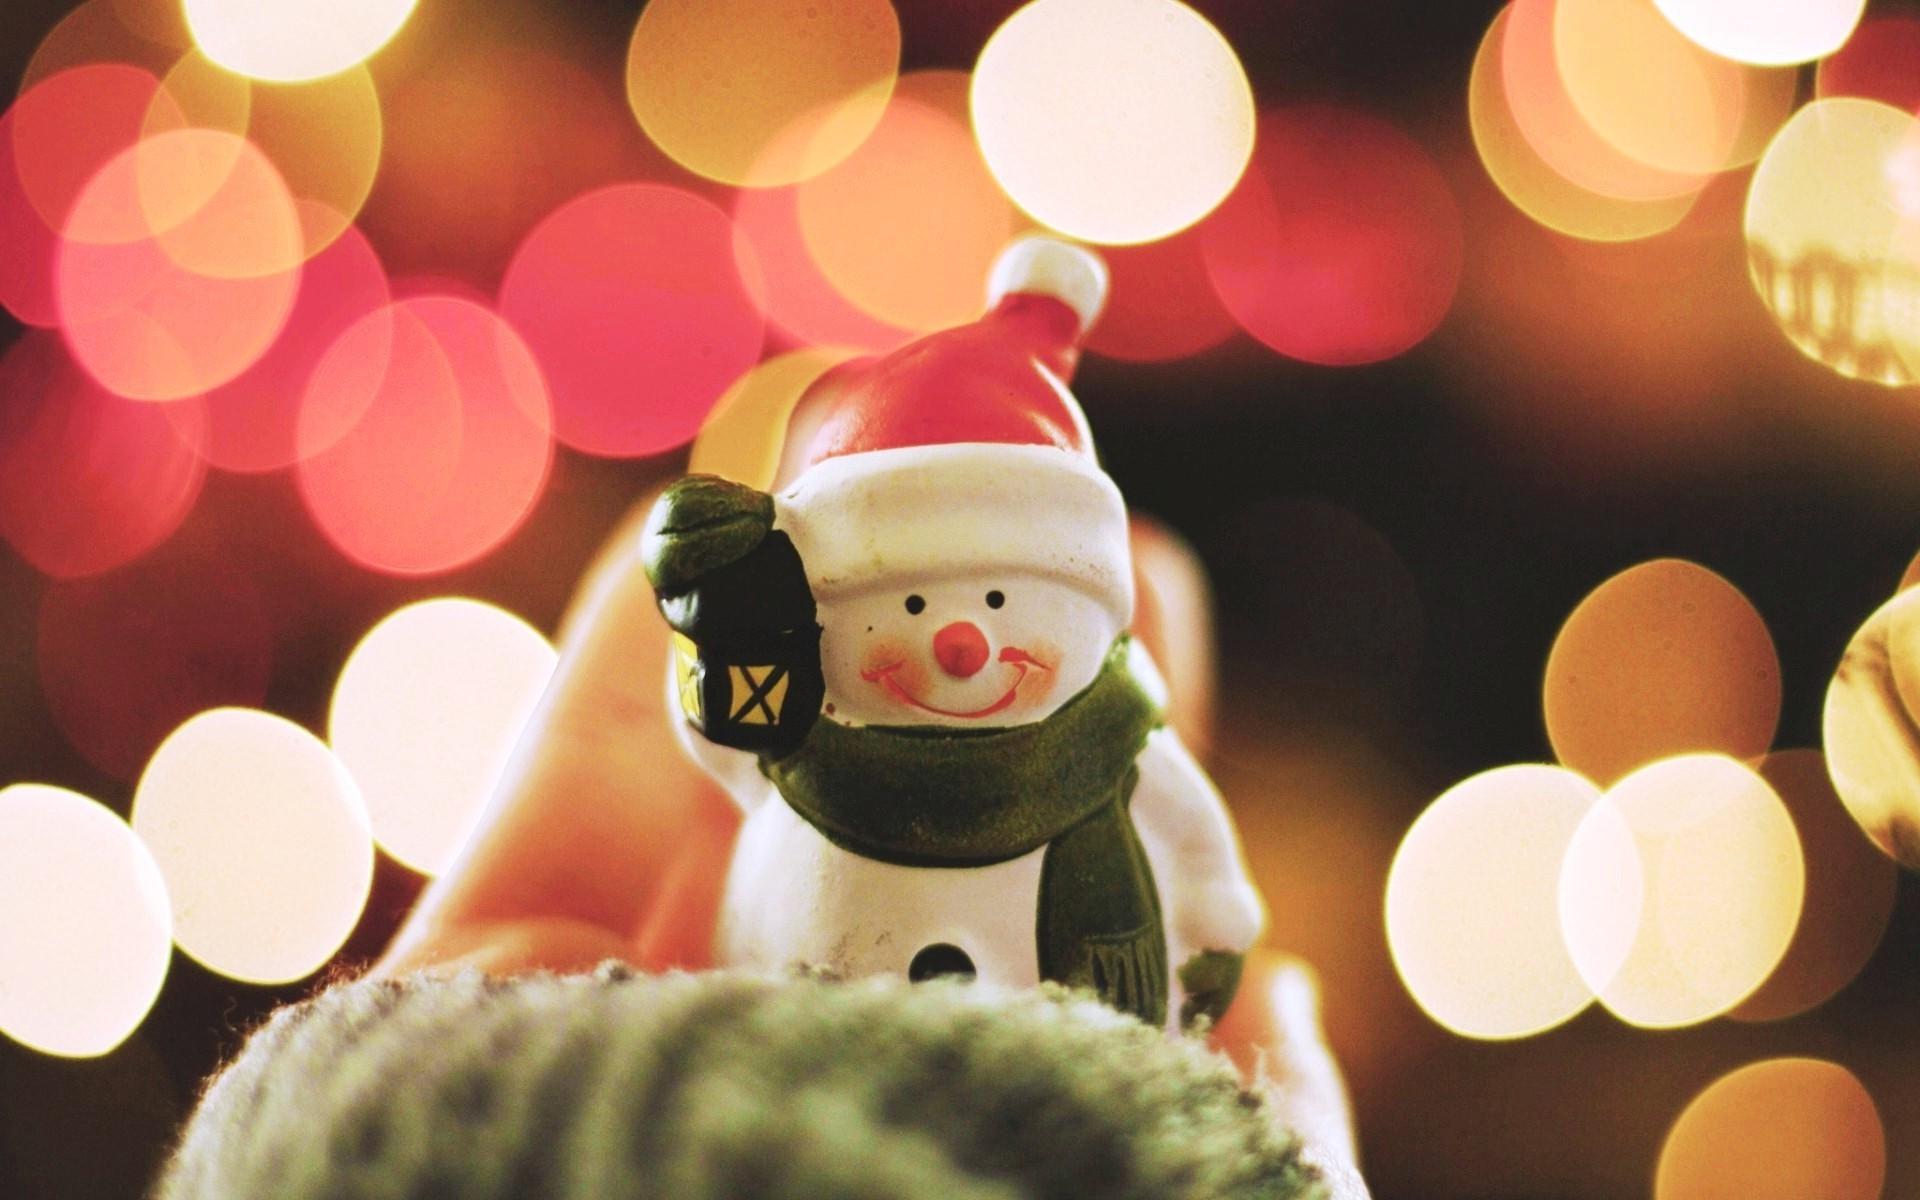 1920x1200, Free Lovely Snowman Wallpaper Download High - Windows 10 Wallpaper Free Download Christmas - HD Wallpaper